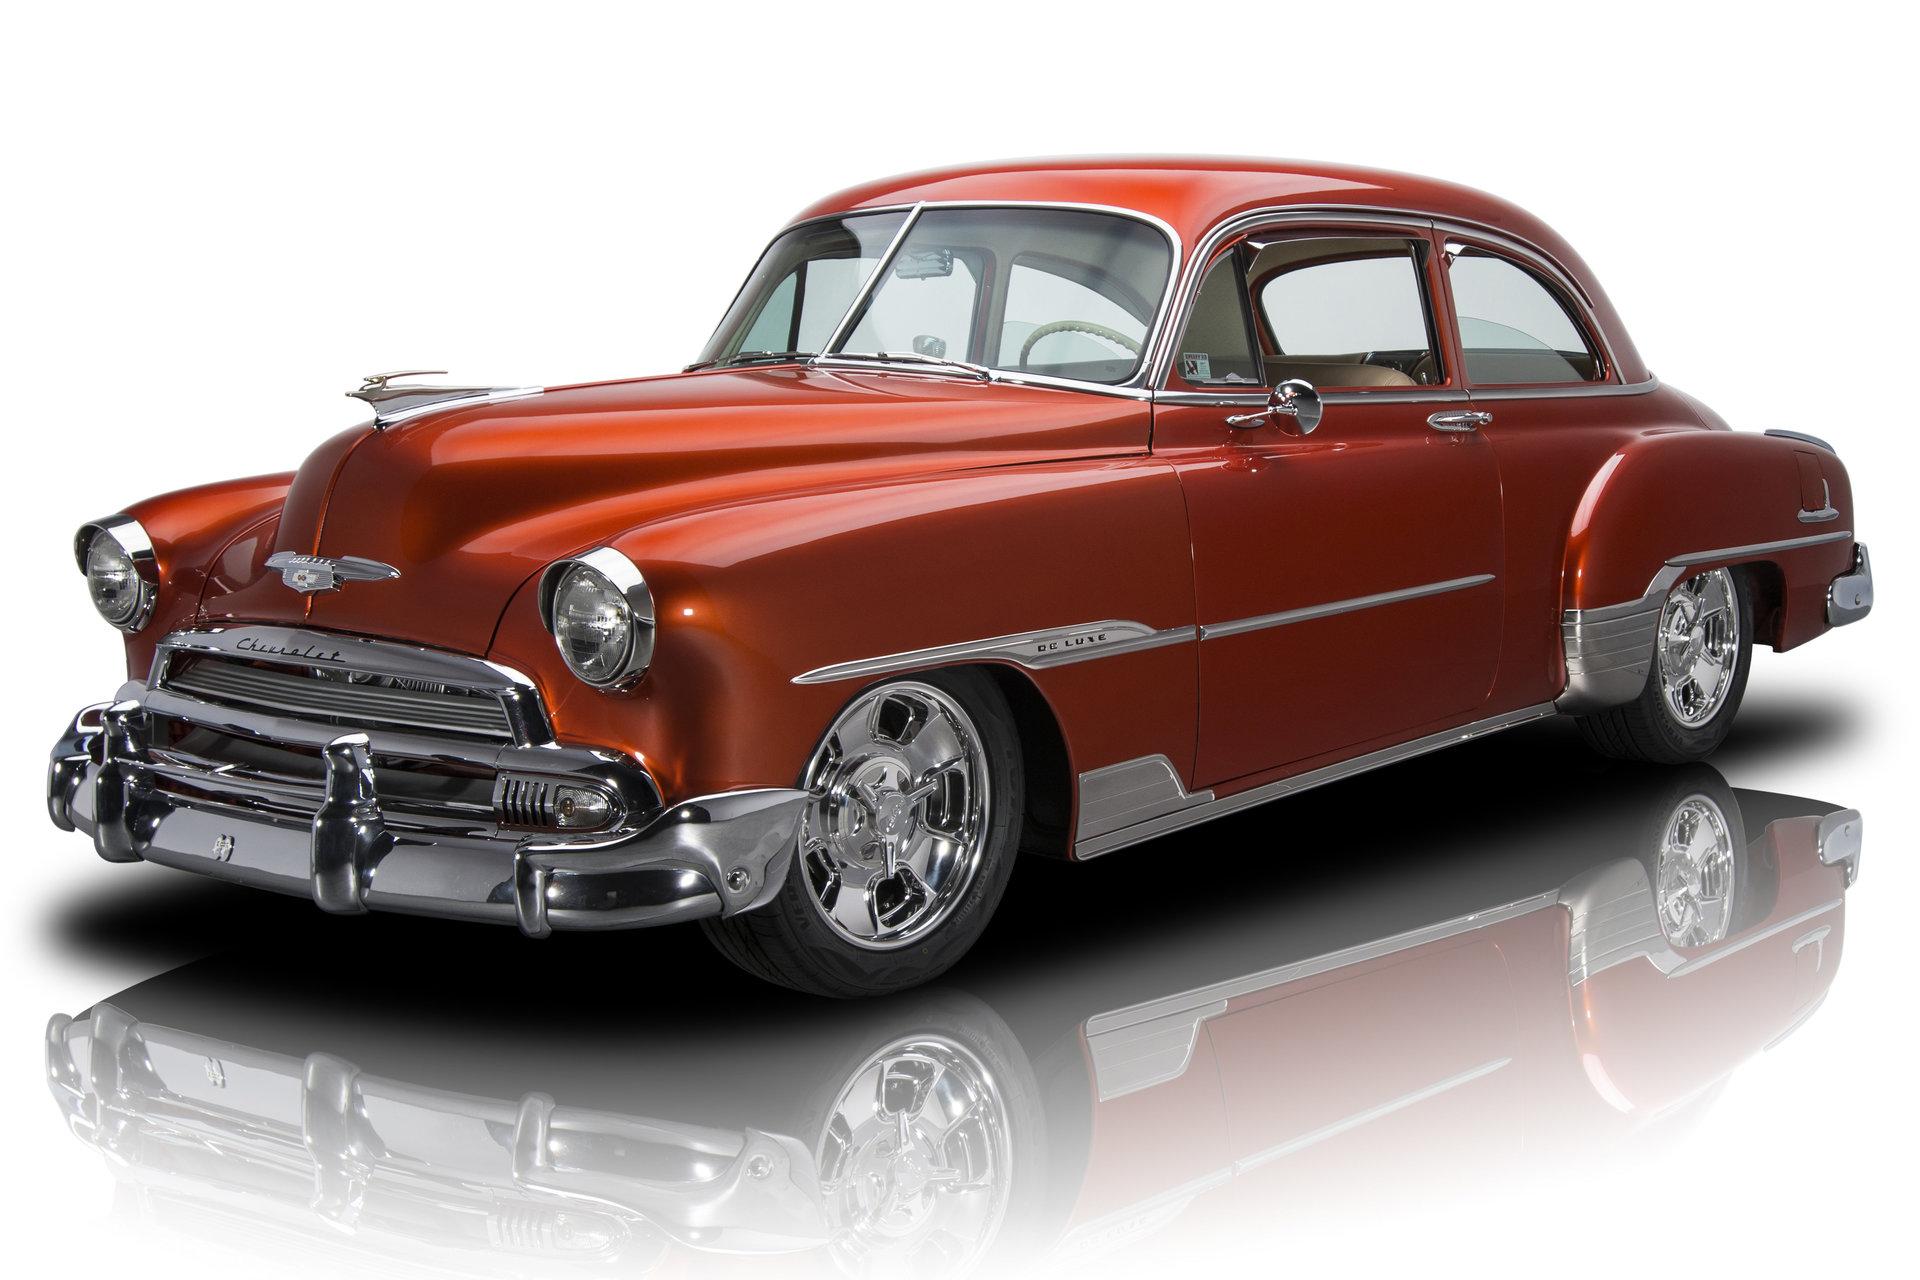 1951 Chevrolet Styleline RK Motors Classic Cars for Sale